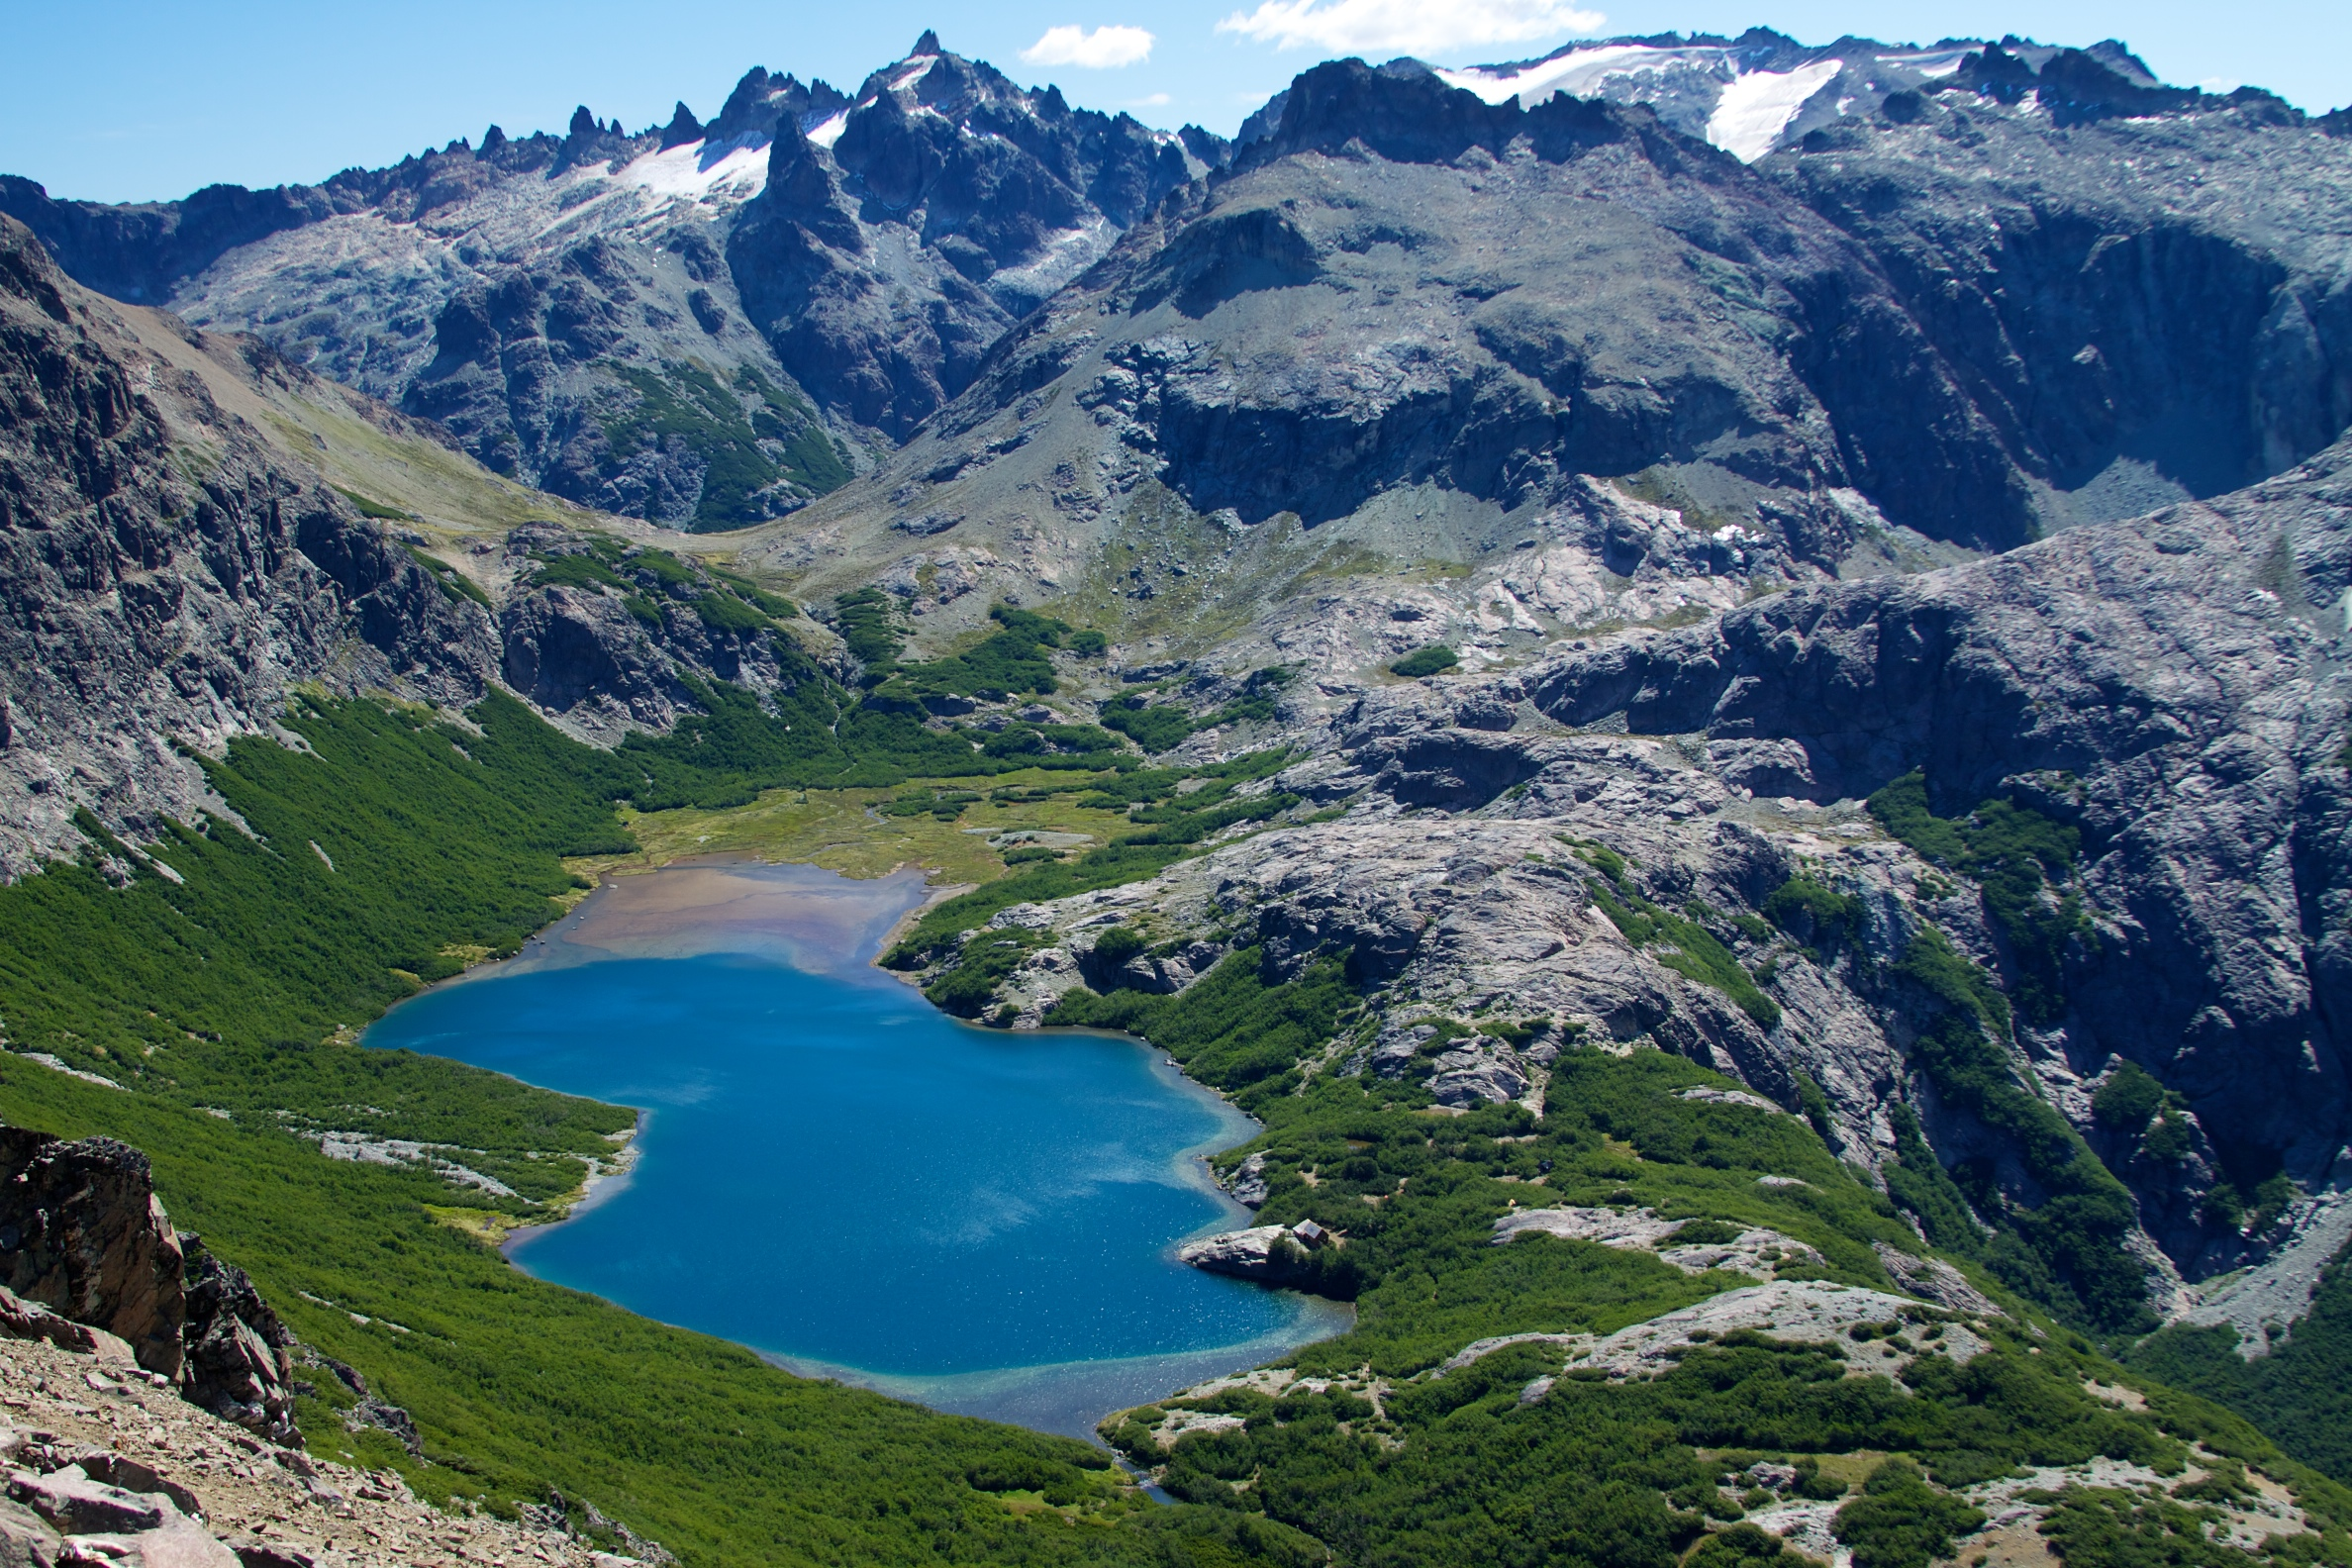 Argentina - Page 2 Argentina_-_Bariloche_trekking_112_-_colourful_Jakob_Lake_(6834307882)